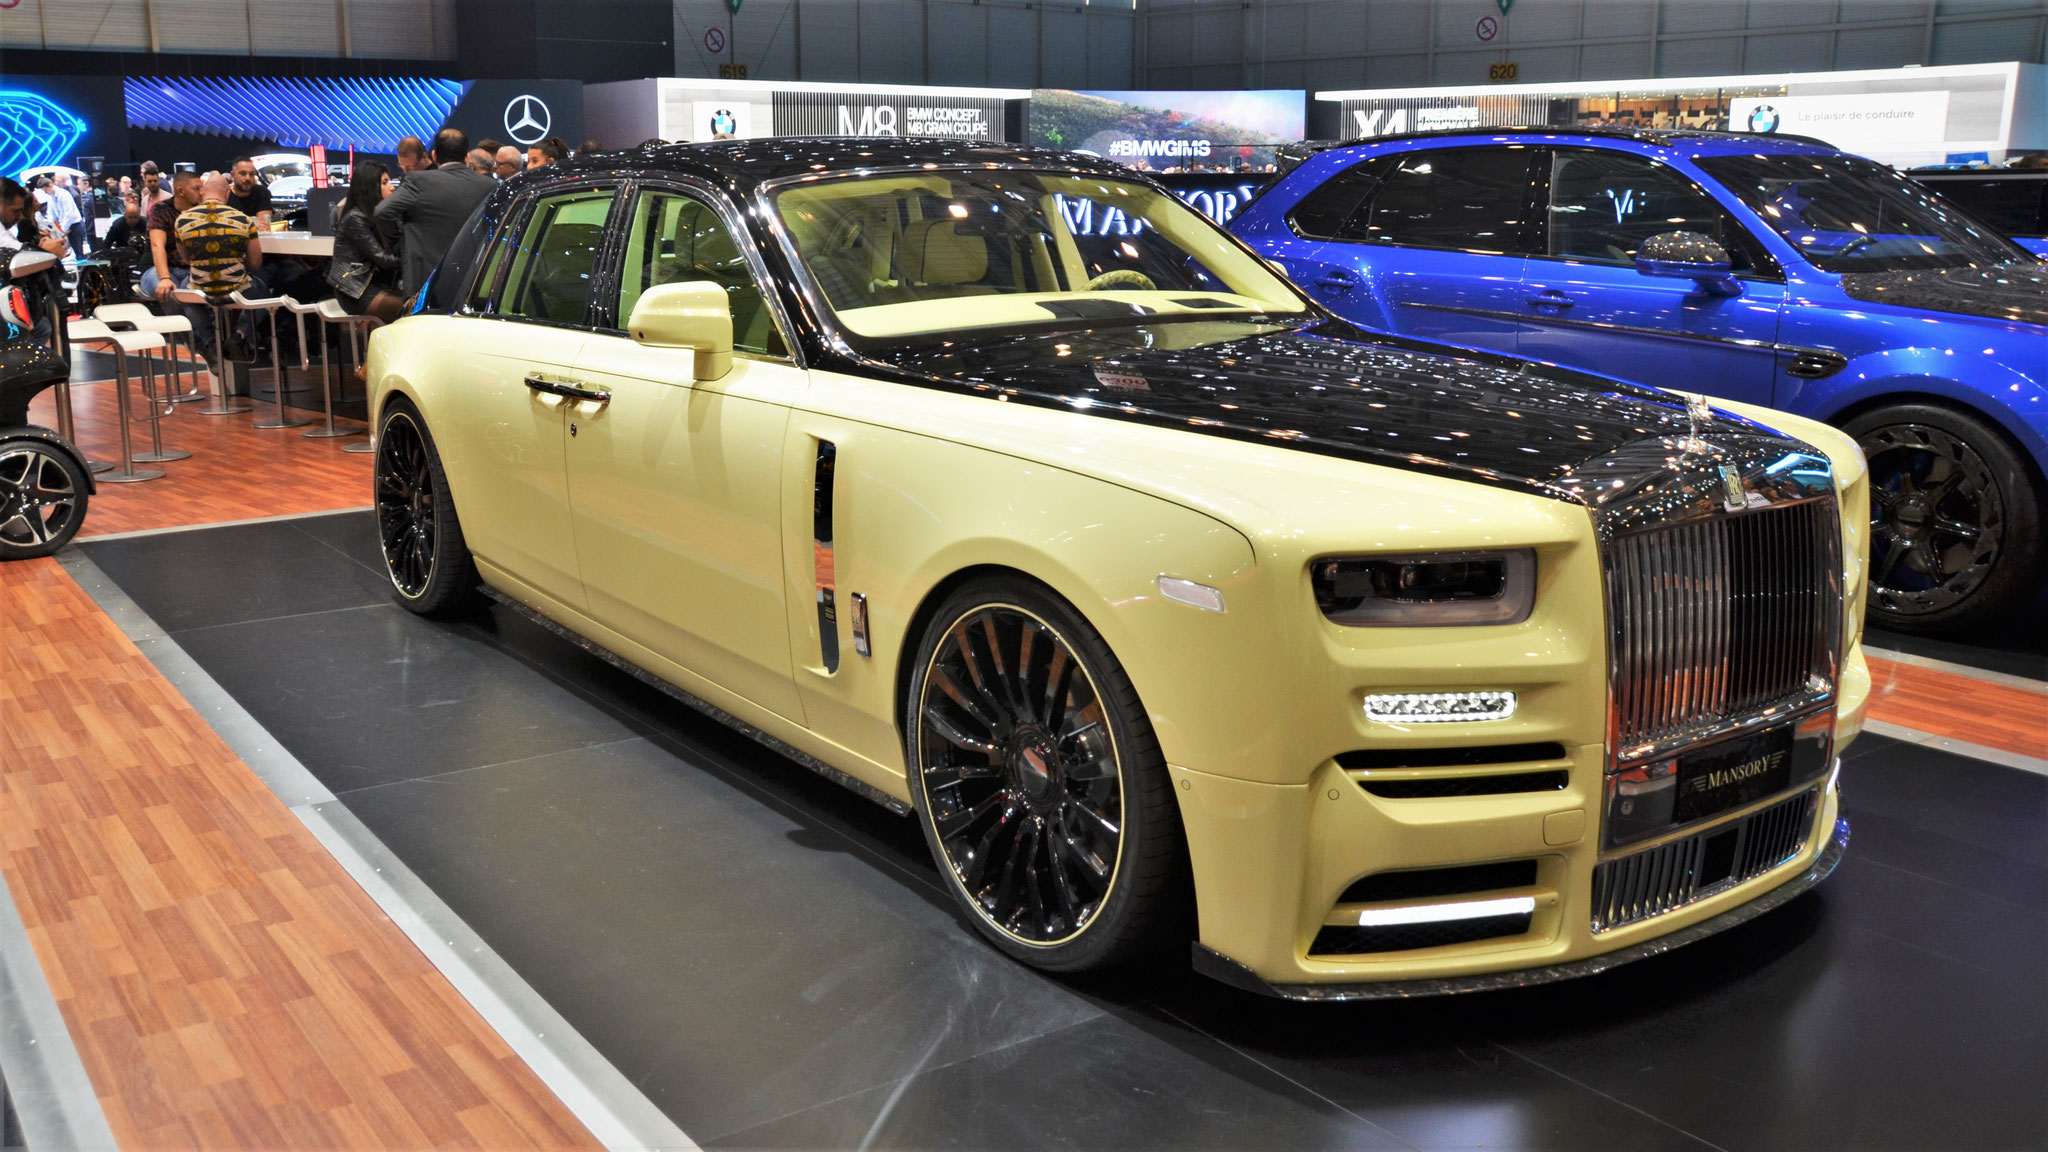 Masory Rolls Royce Phantom - 1141 (QAT)